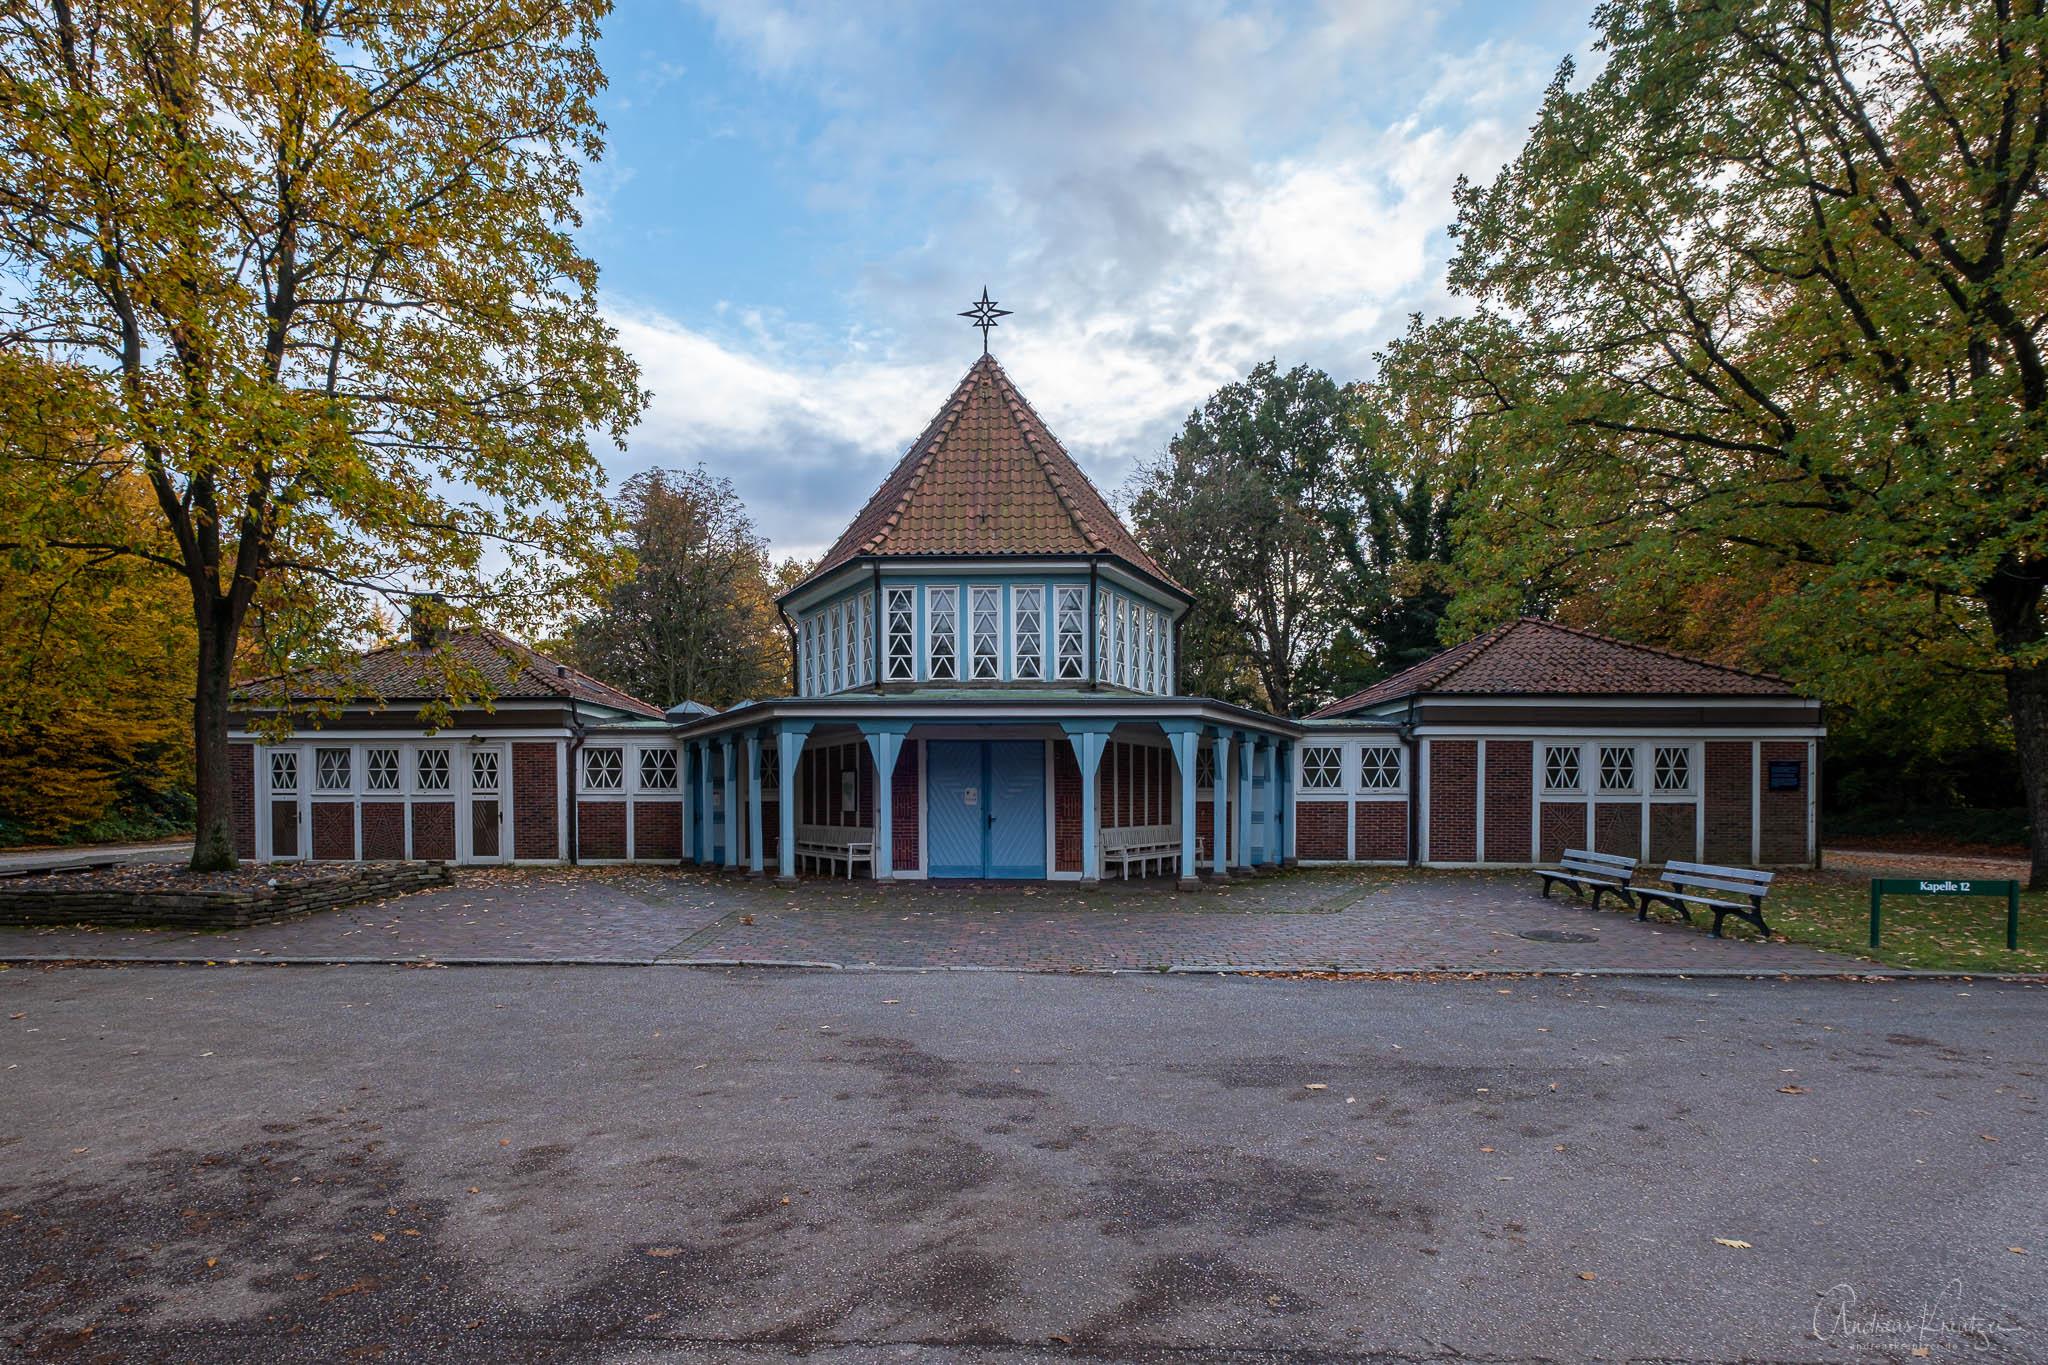 Kapelle 12 auf dem Ohlsdorfer Friedhof